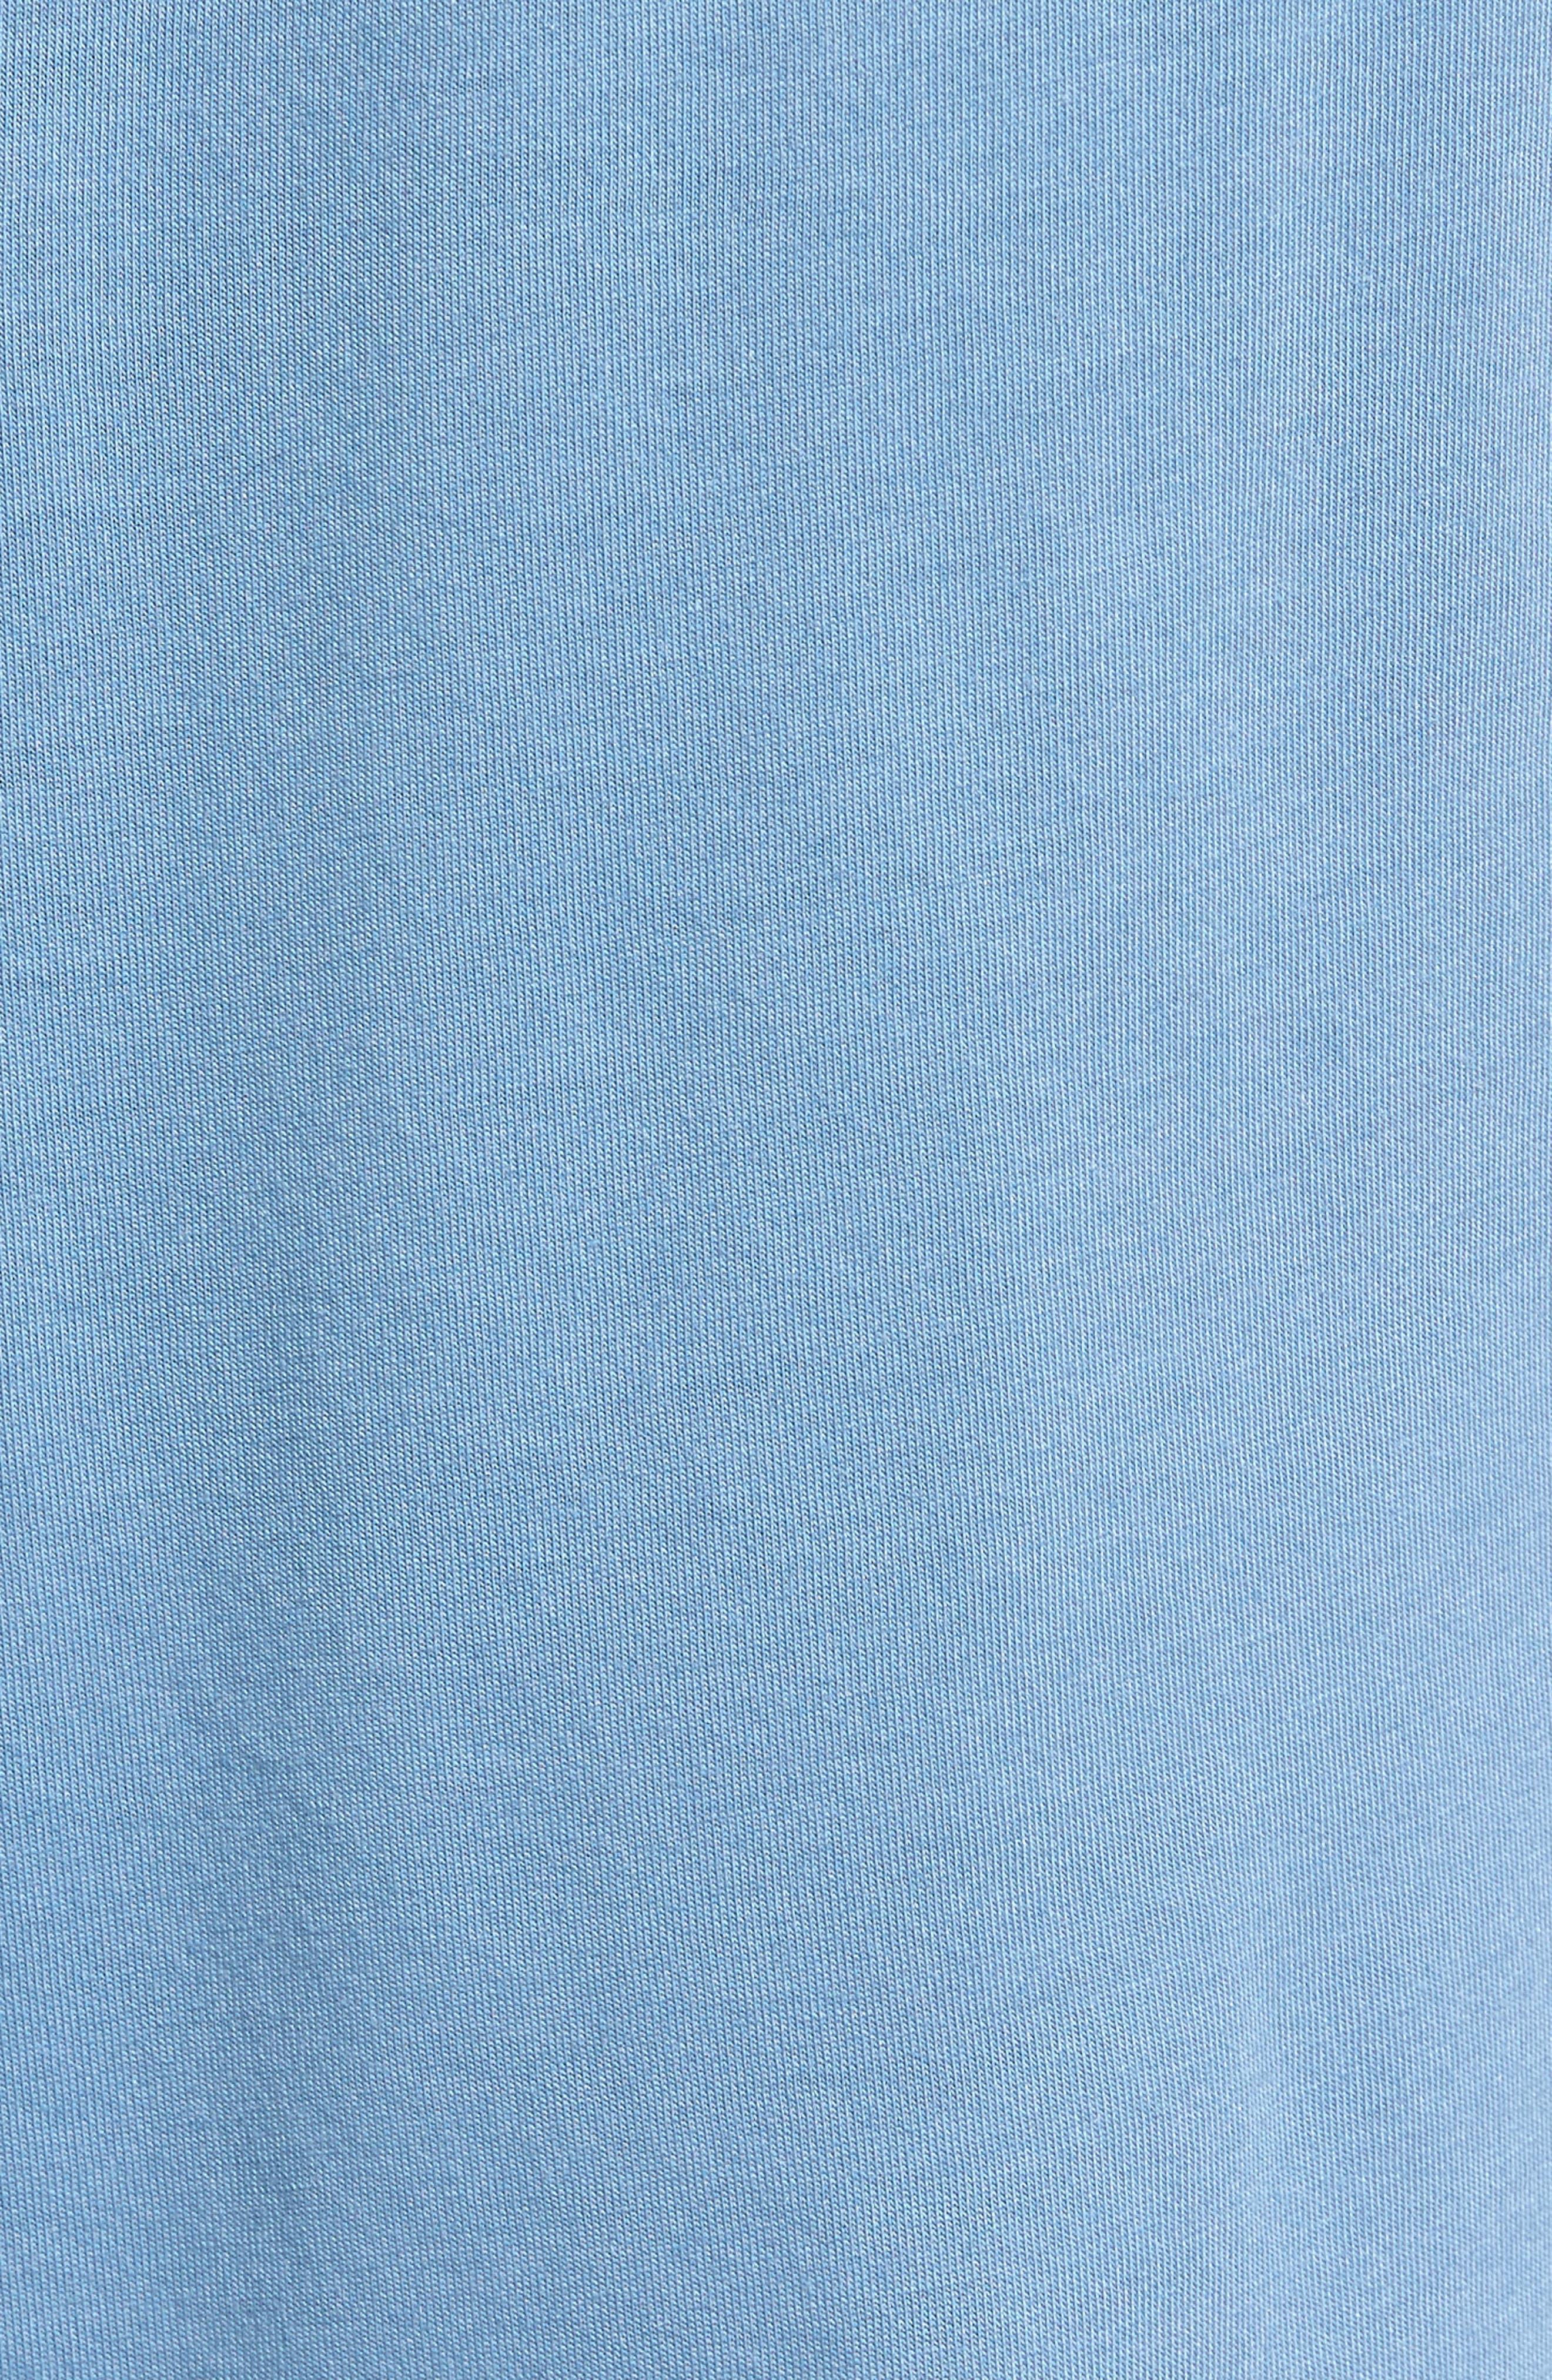 Pima Cotton & Modal Lounge Shorts,                             Alternate thumbnail 5, color,                             400